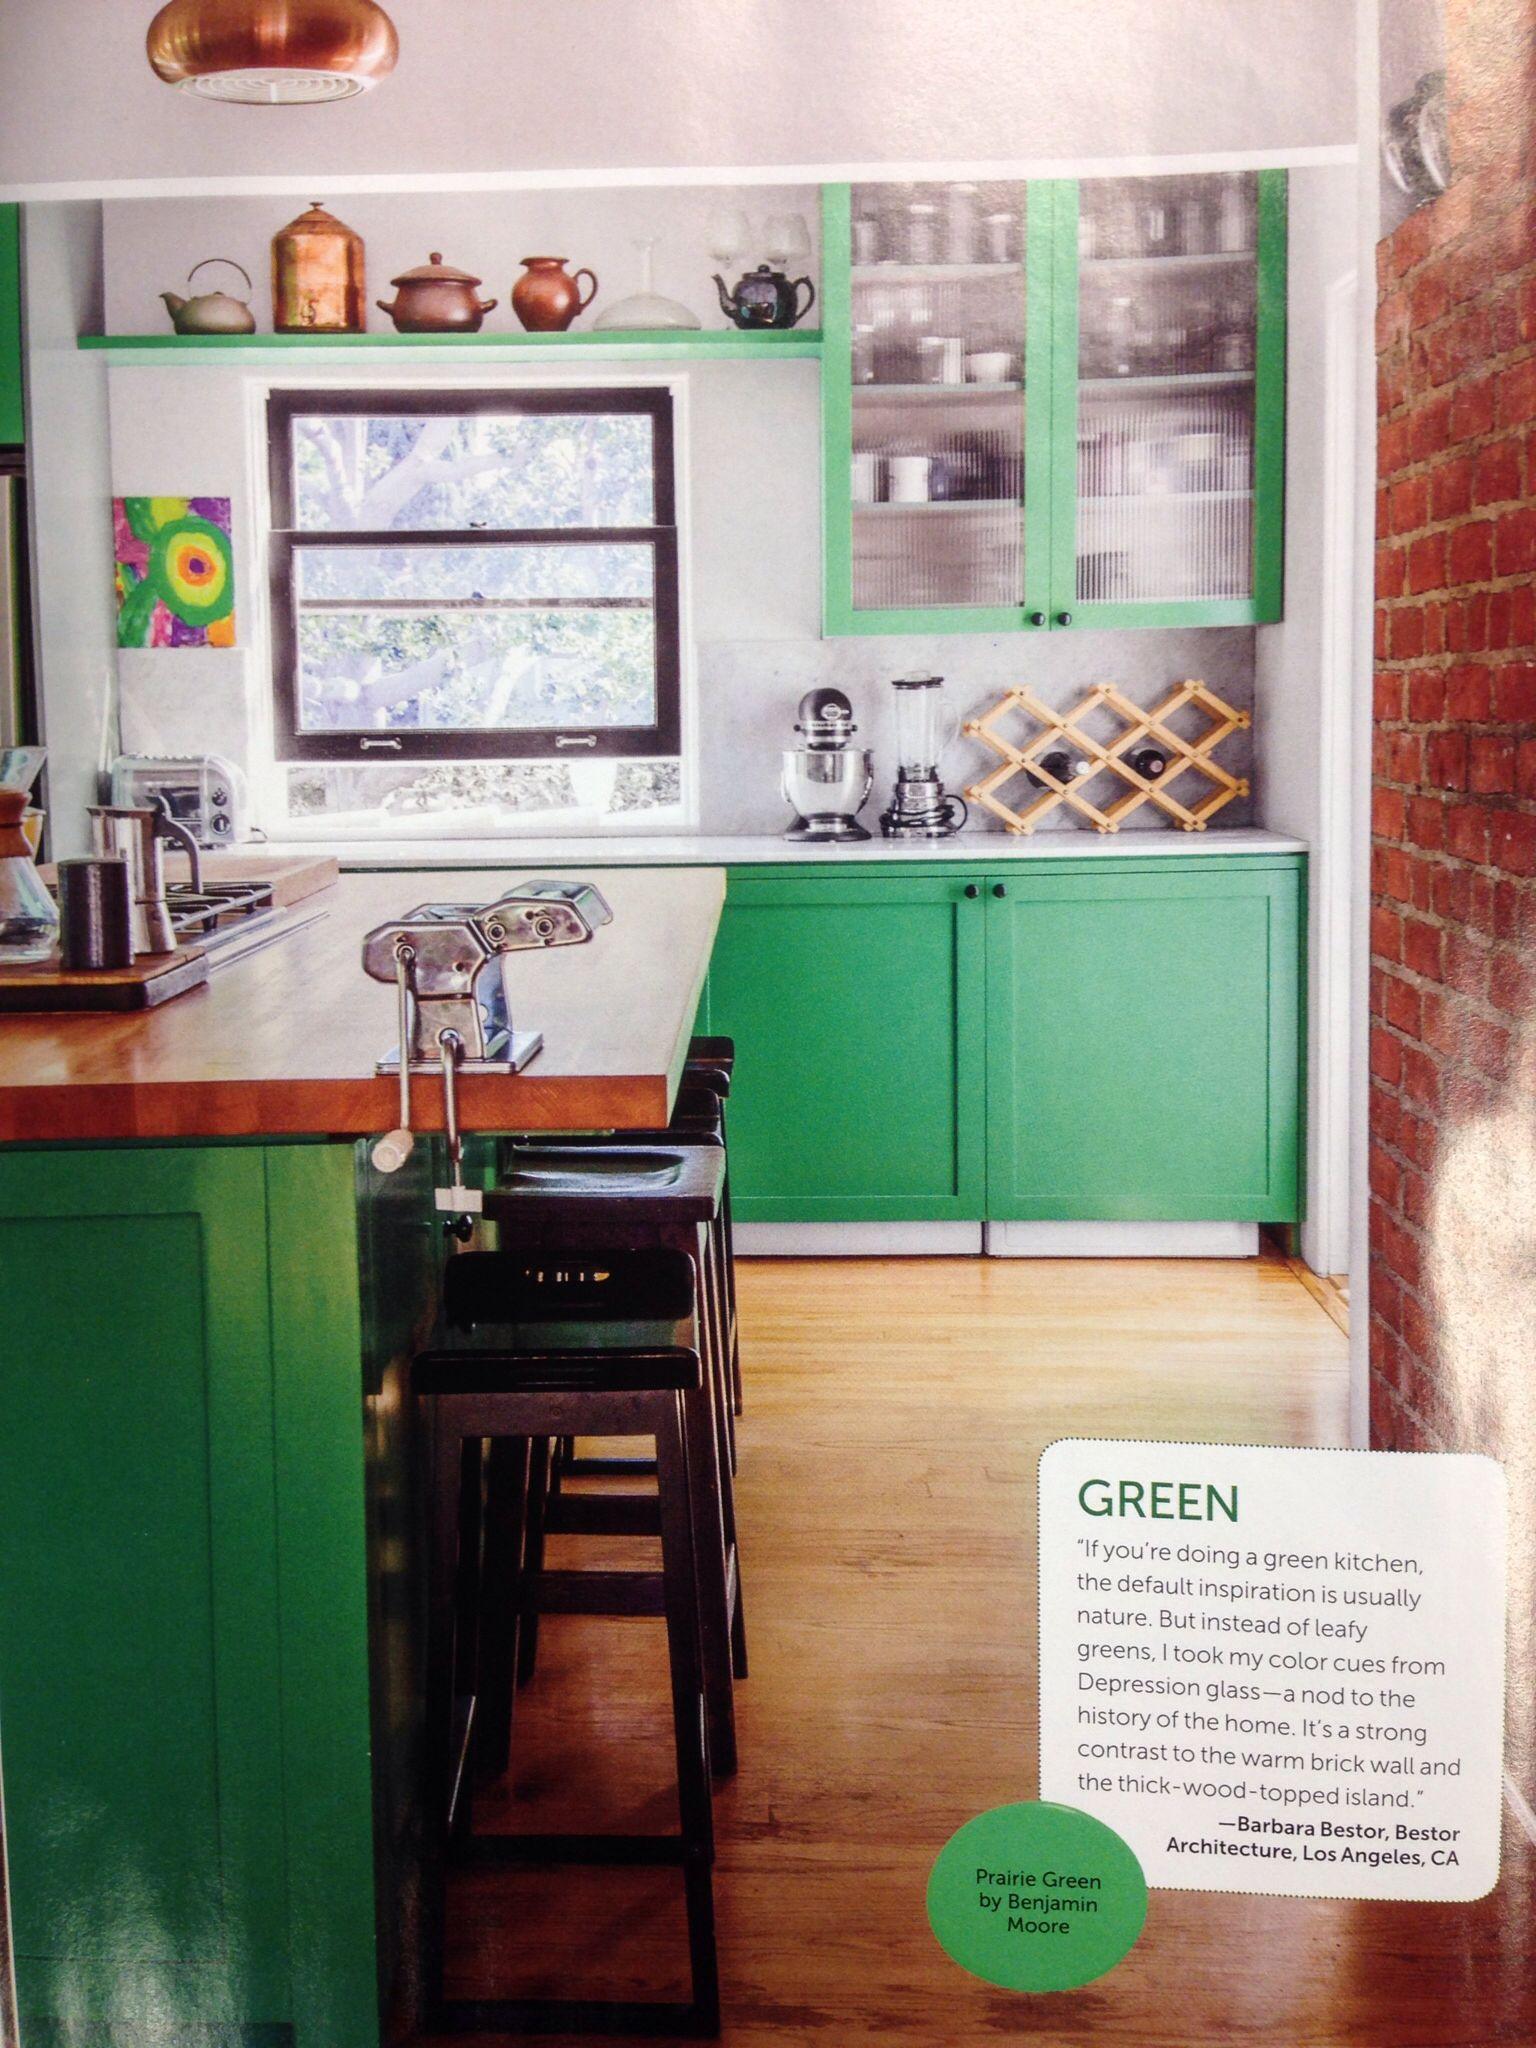 Green kitchen cabinets - HGTV magazine | Green kitchen ...